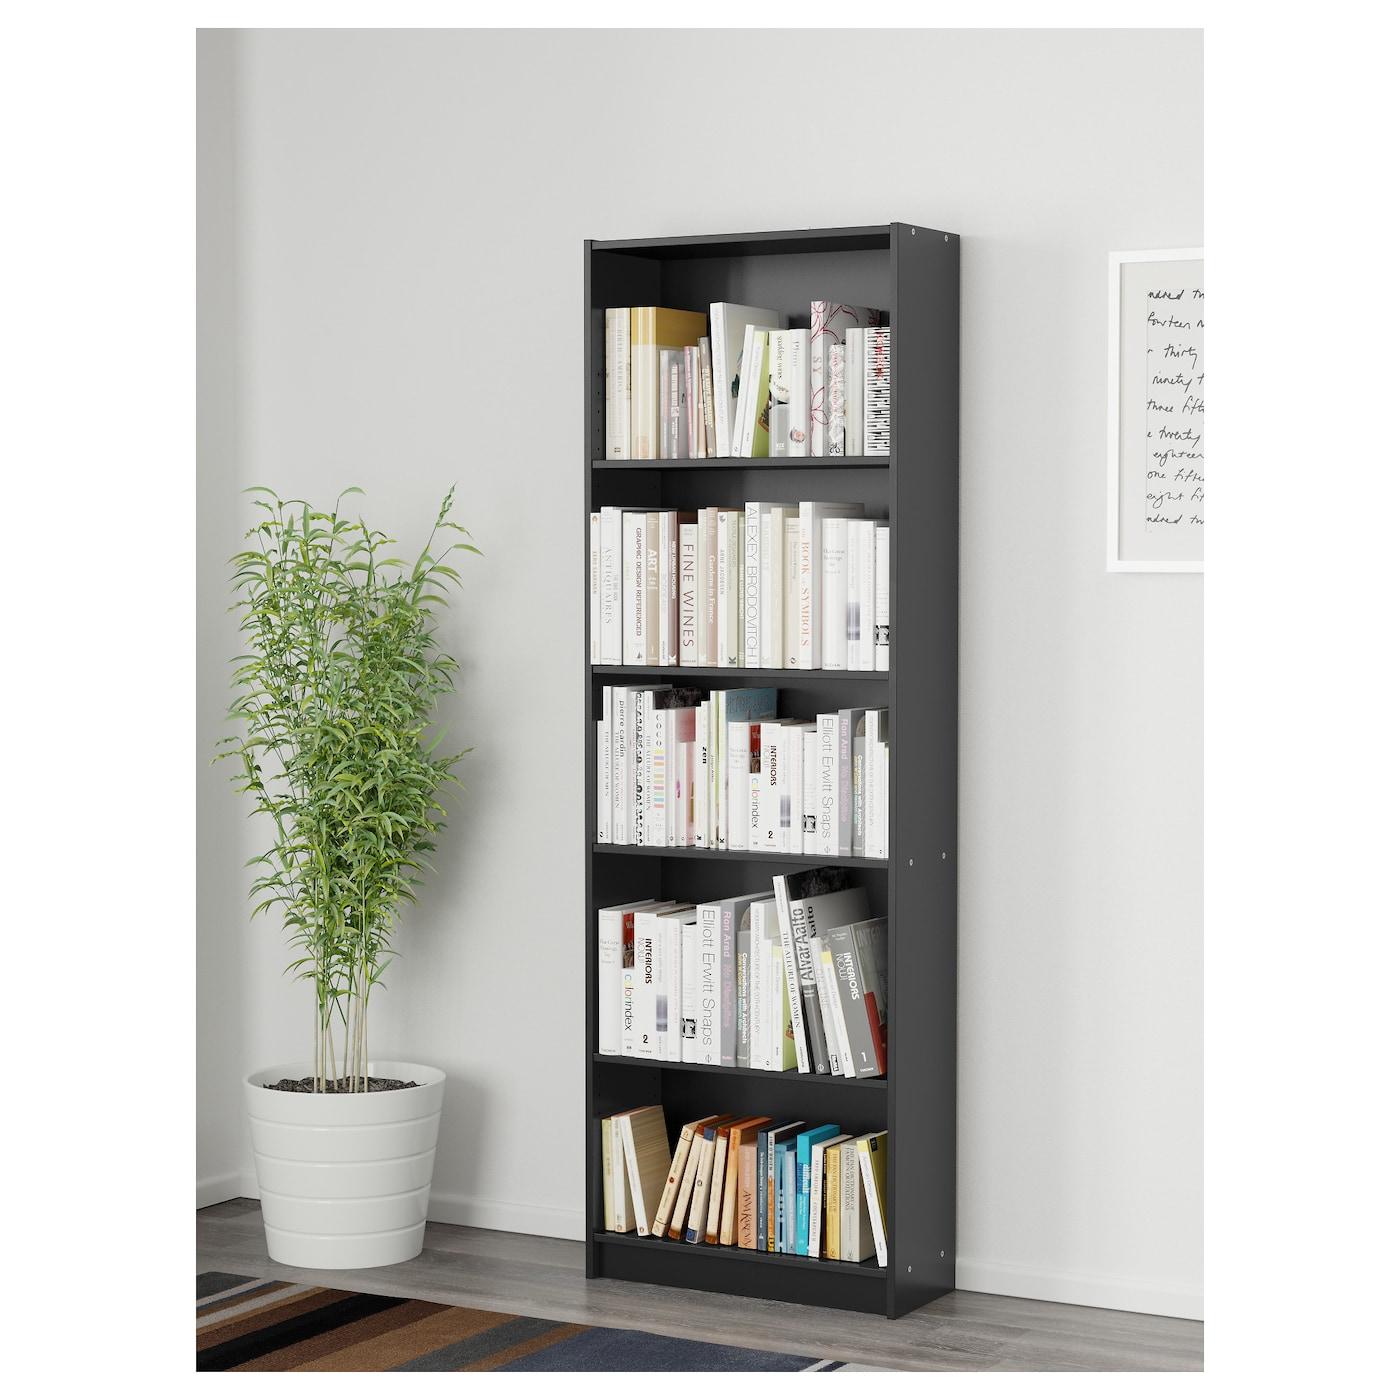 finnby biblioth que noir 60 x 180 cm ikea. Black Bedroom Furniture Sets. Home Design Ideas